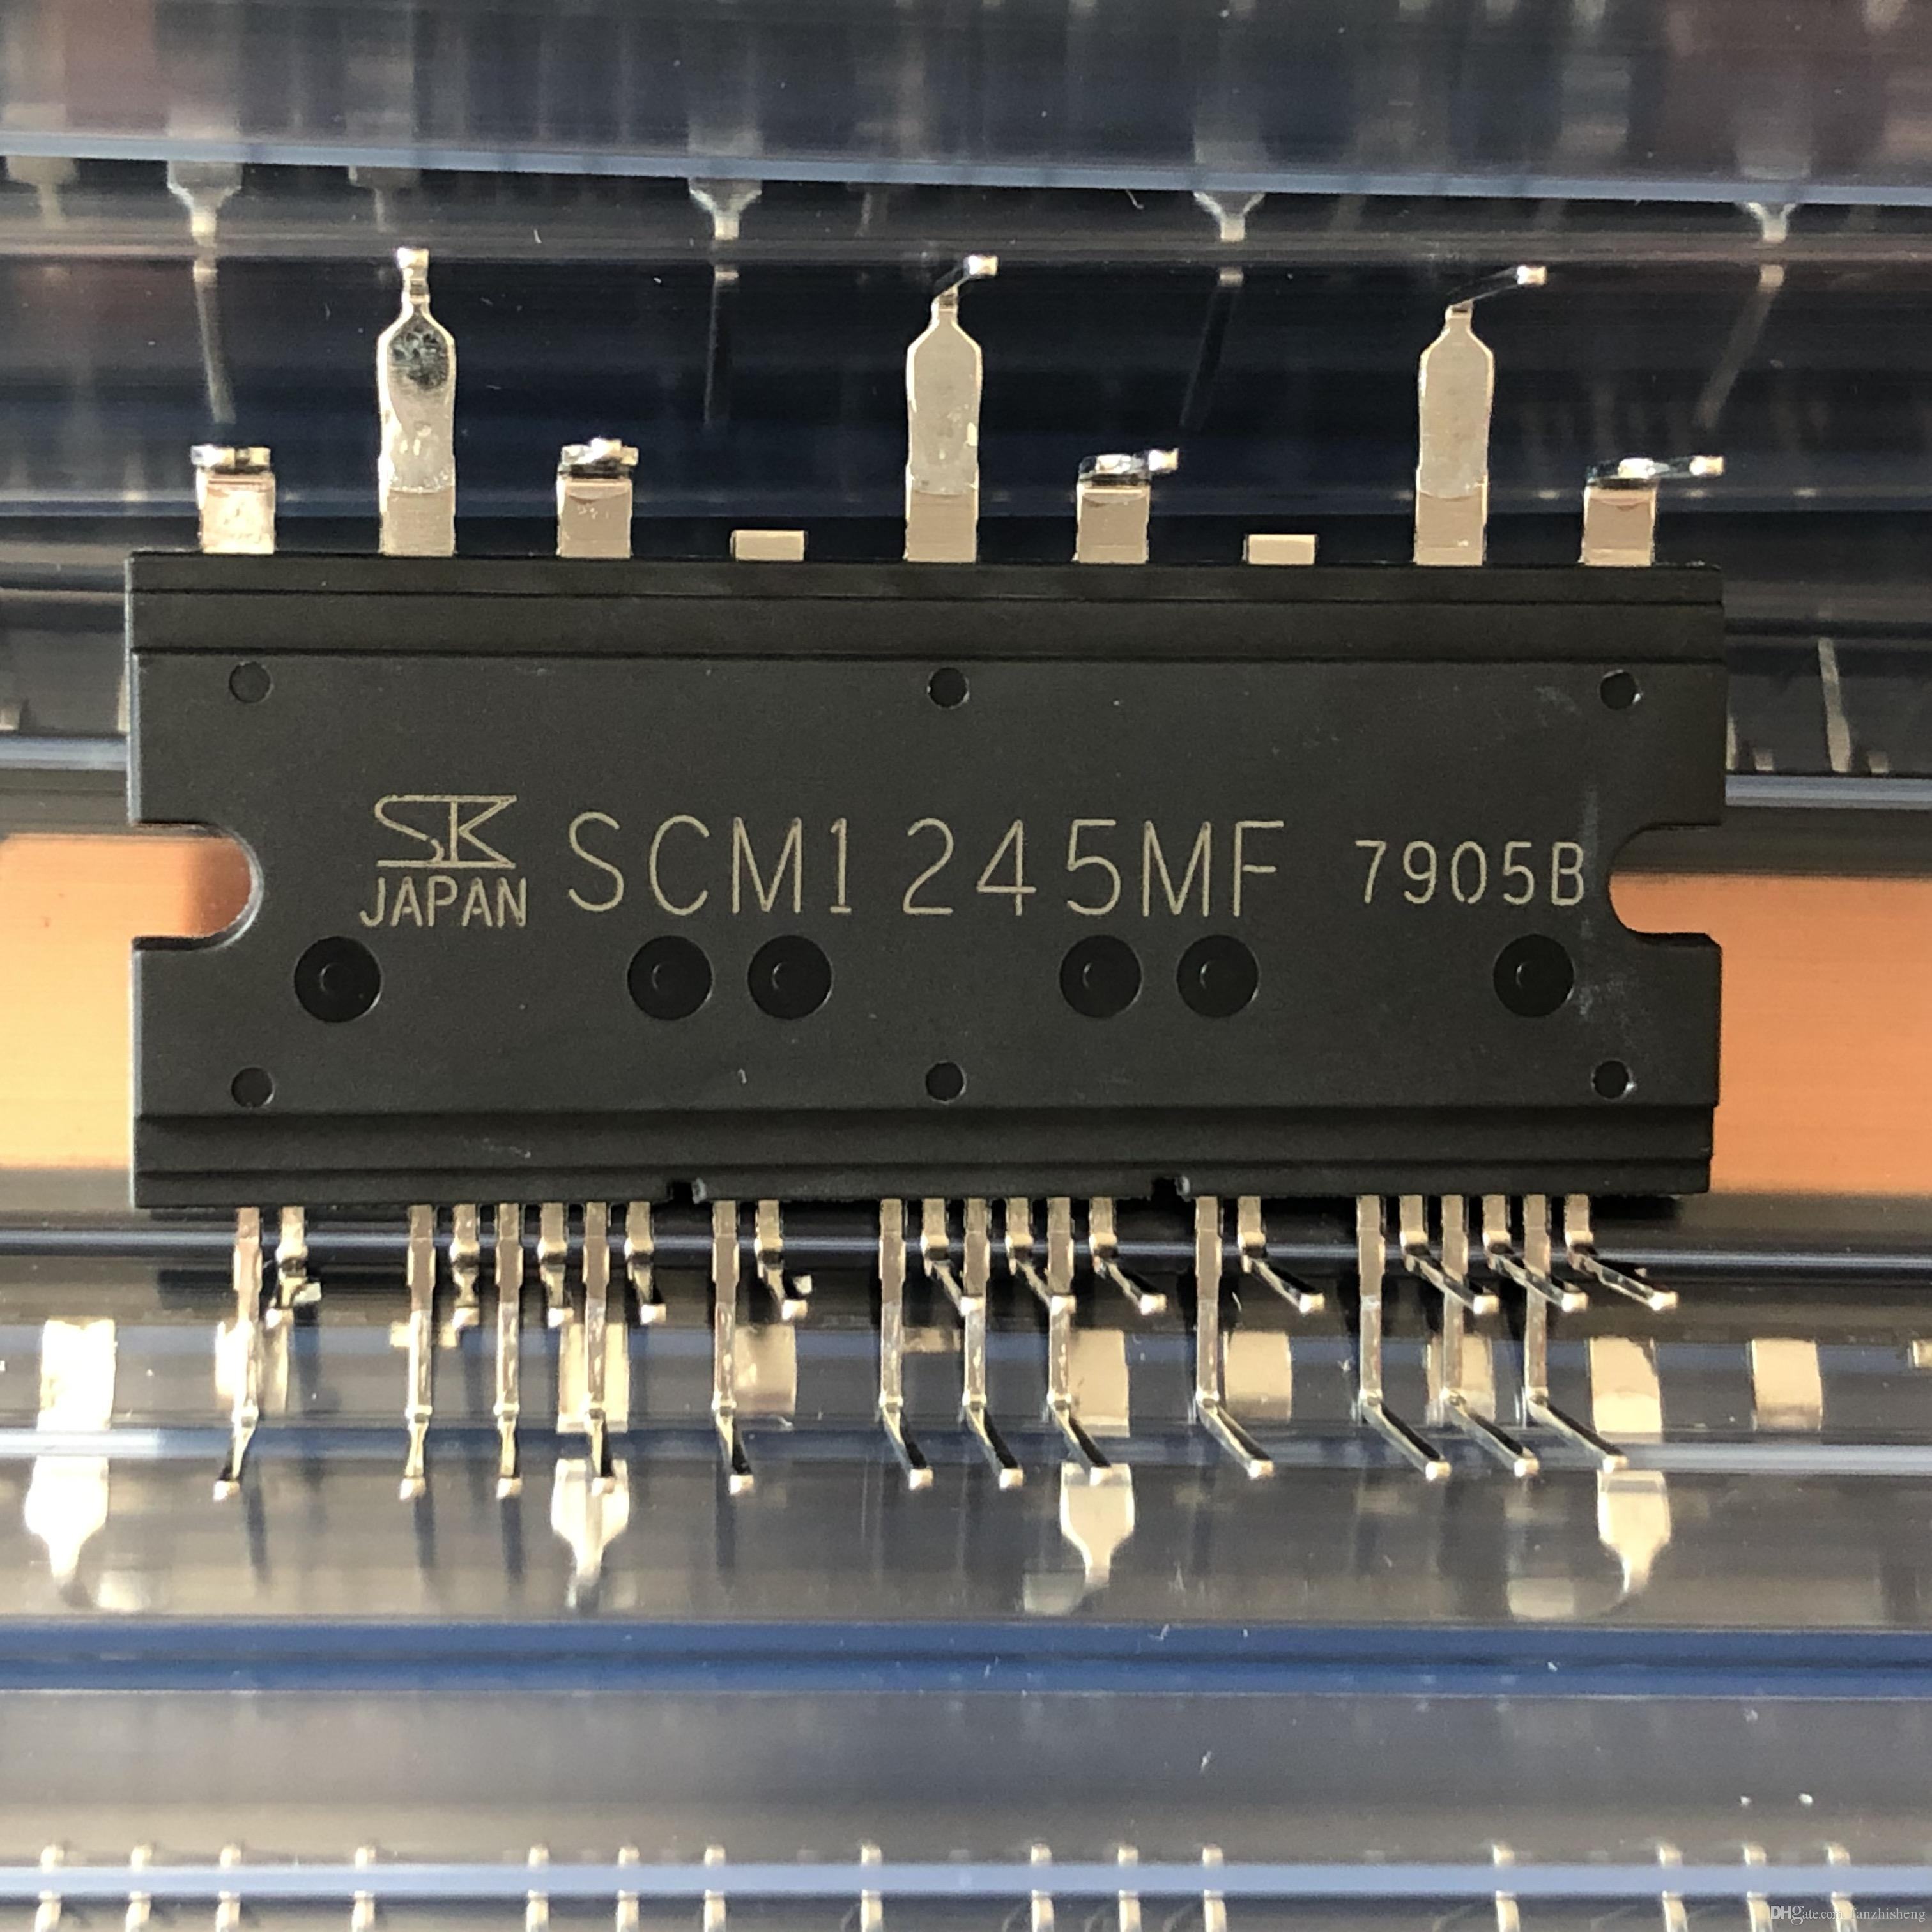 5 TEILE / LOS NEUE original SCM1245MF SCM1242MF SCM1243MF A6059H STR-A6059H DIP-7 OB3362RP OB3362RPF Die qualität der realen sache, ist sehr gut